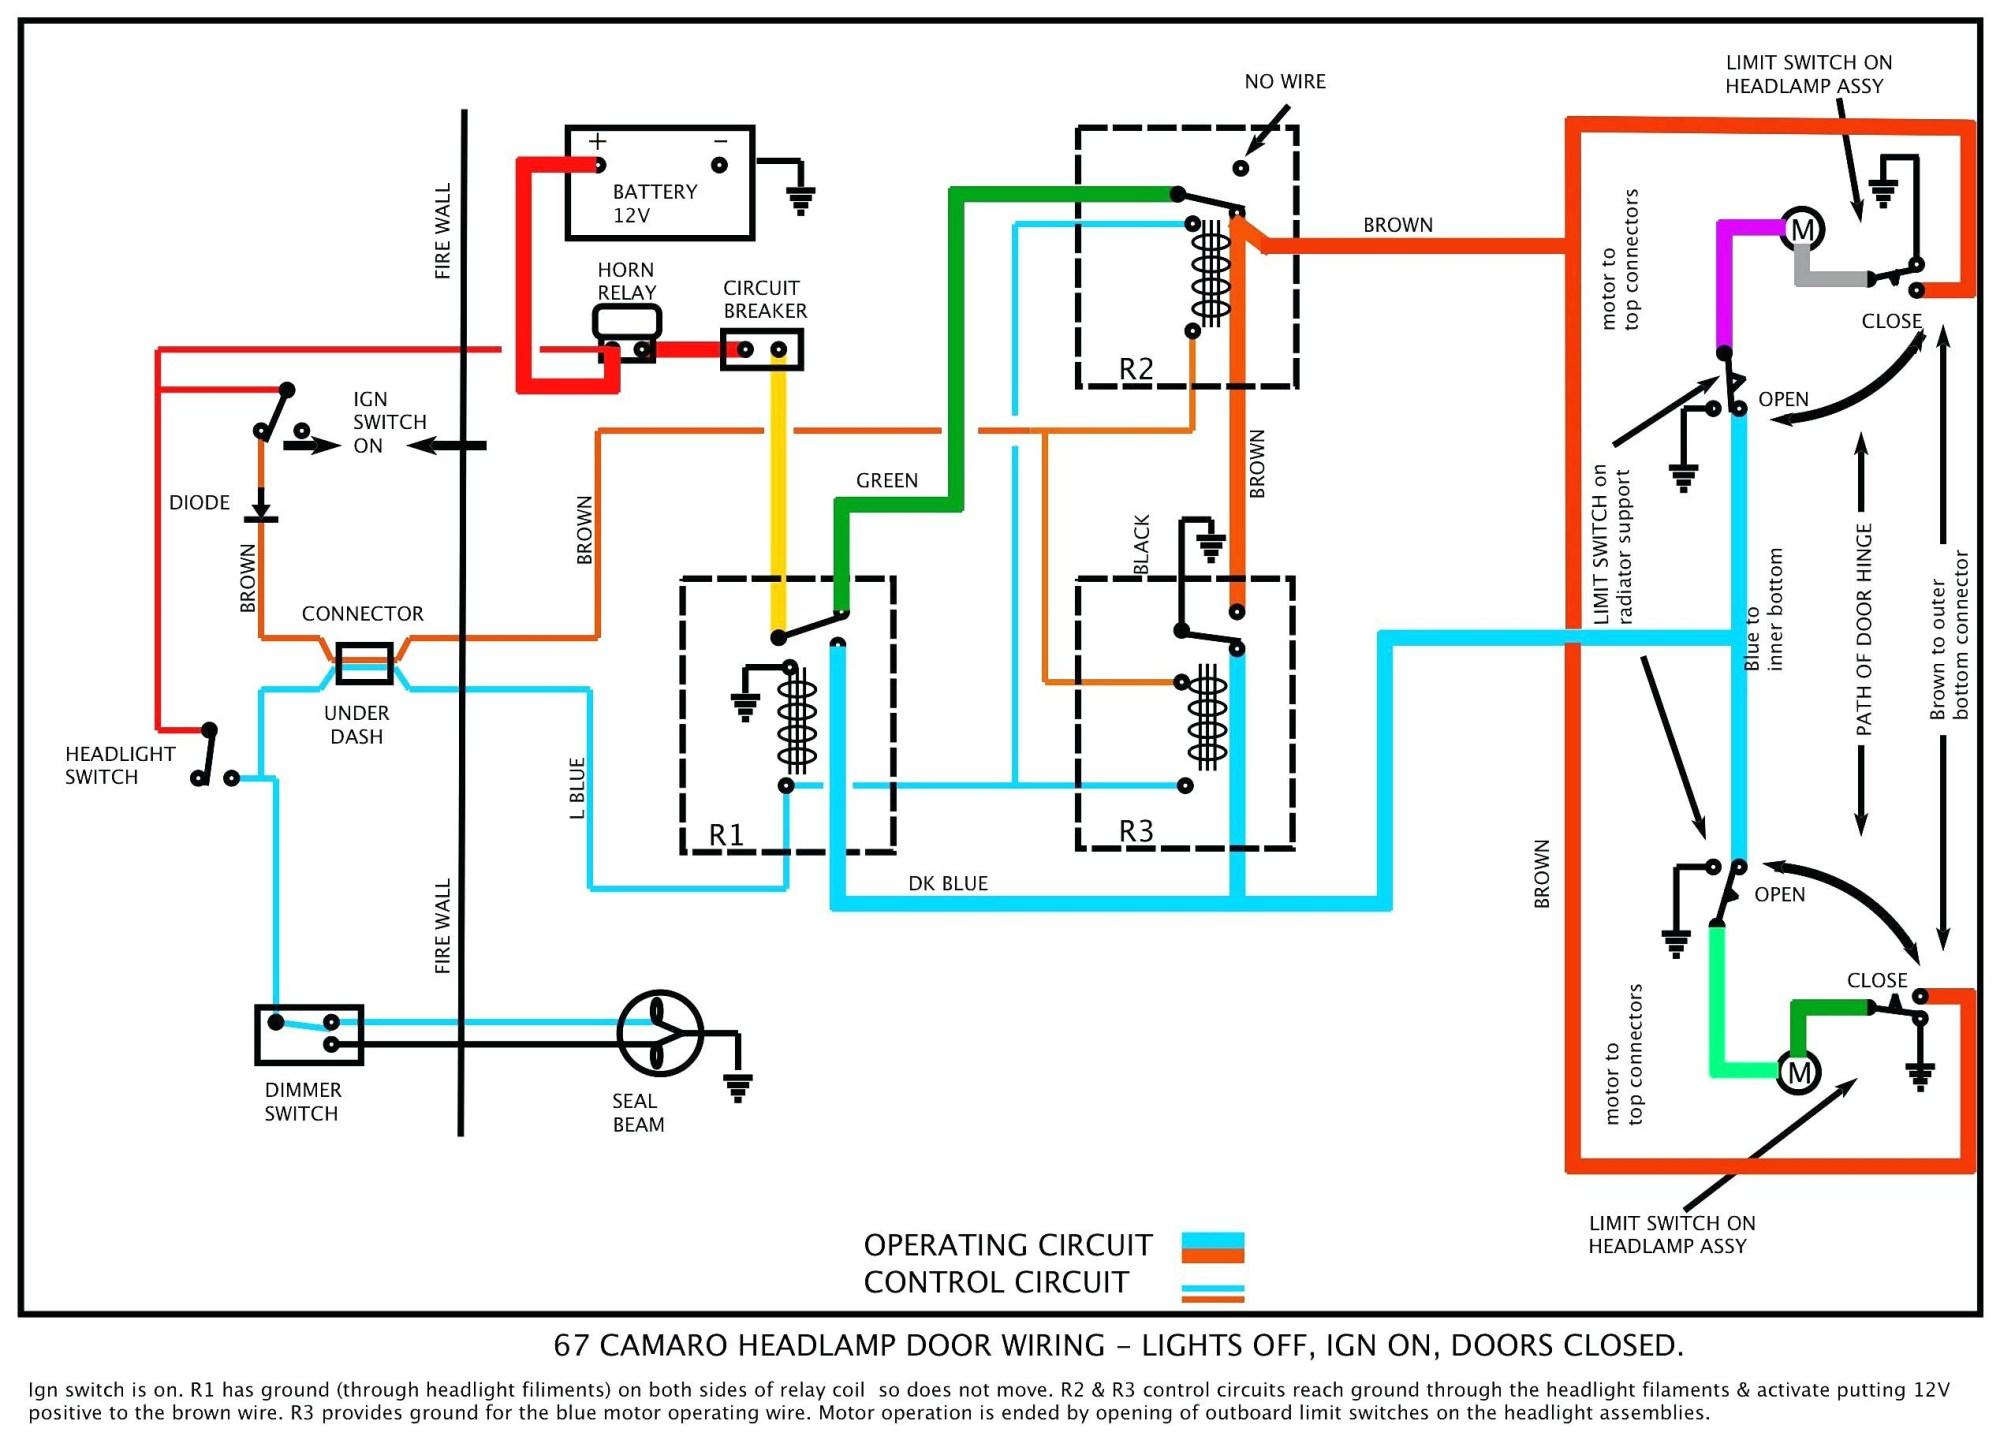 hight resolution of genuine bosch horn relay wiring diagram 11962 in philteg ingenuine bosch horn relay wiring diagram 11962